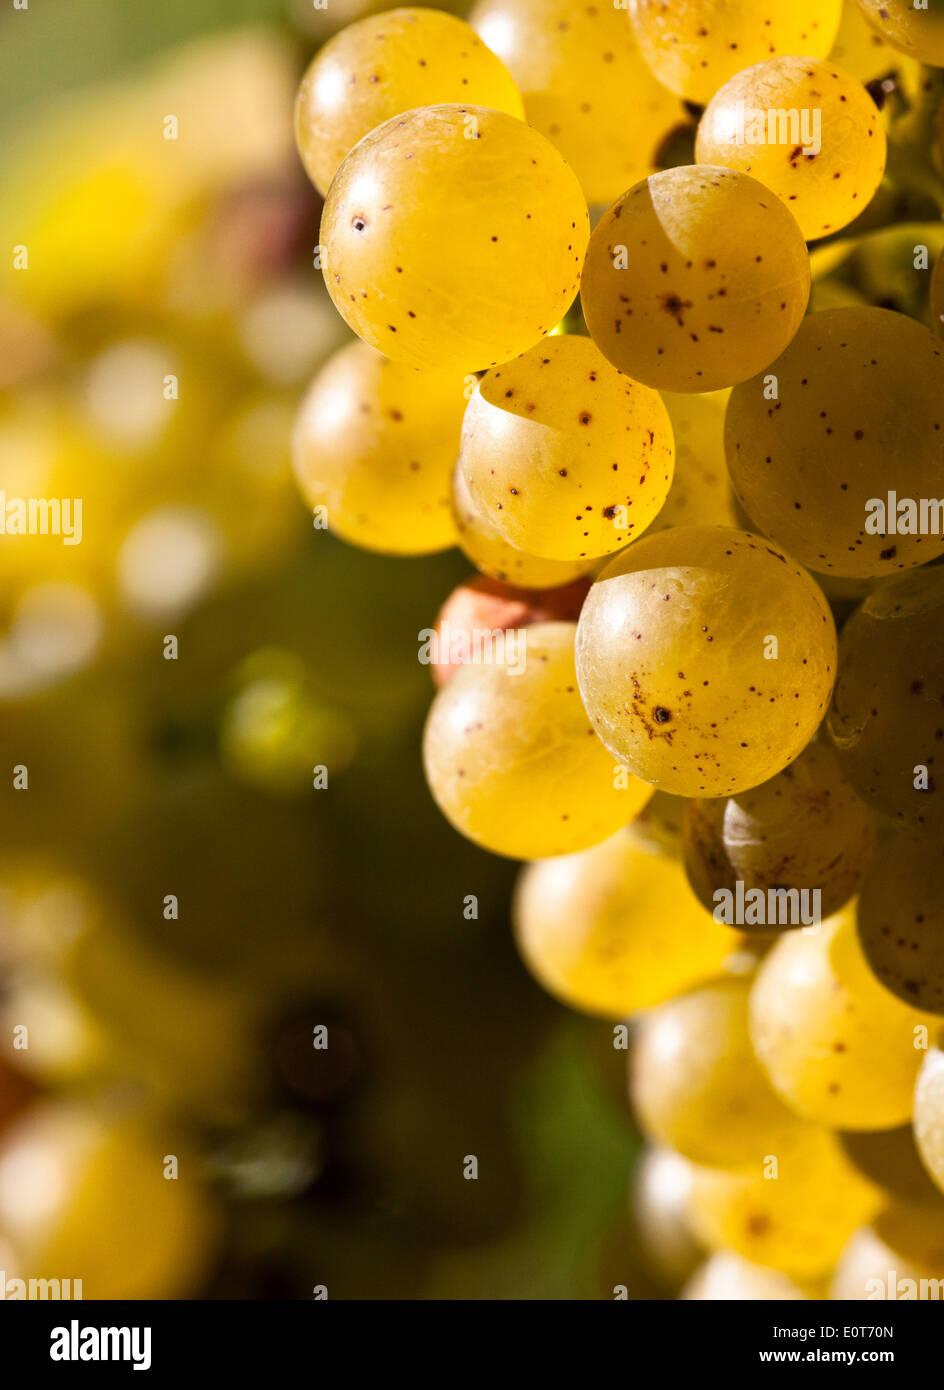 Weintrauben am Rebstock, Wachau - Grapes Stock Photo